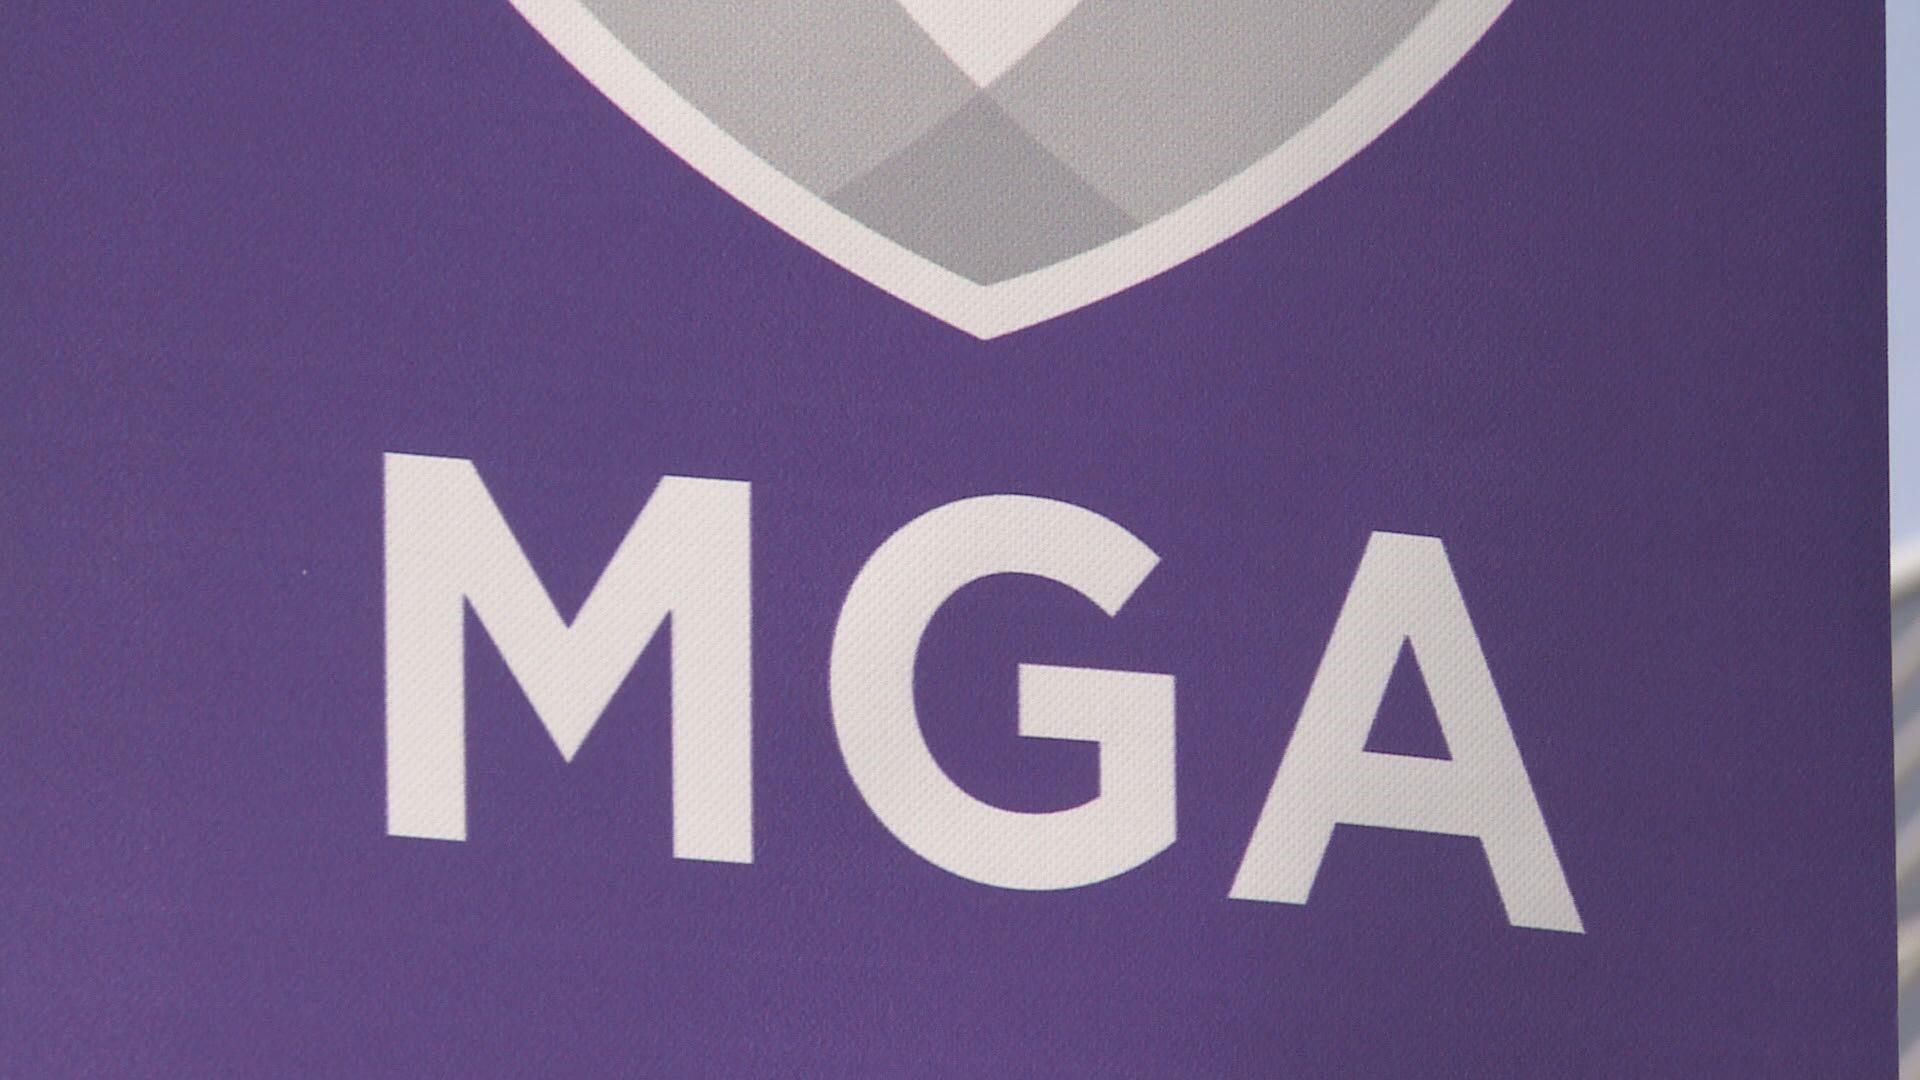 Mgsu Adjusts Academic Calendar And Deadlines Following Covid 19 Closings Inside Georgia State University Academic Calendar